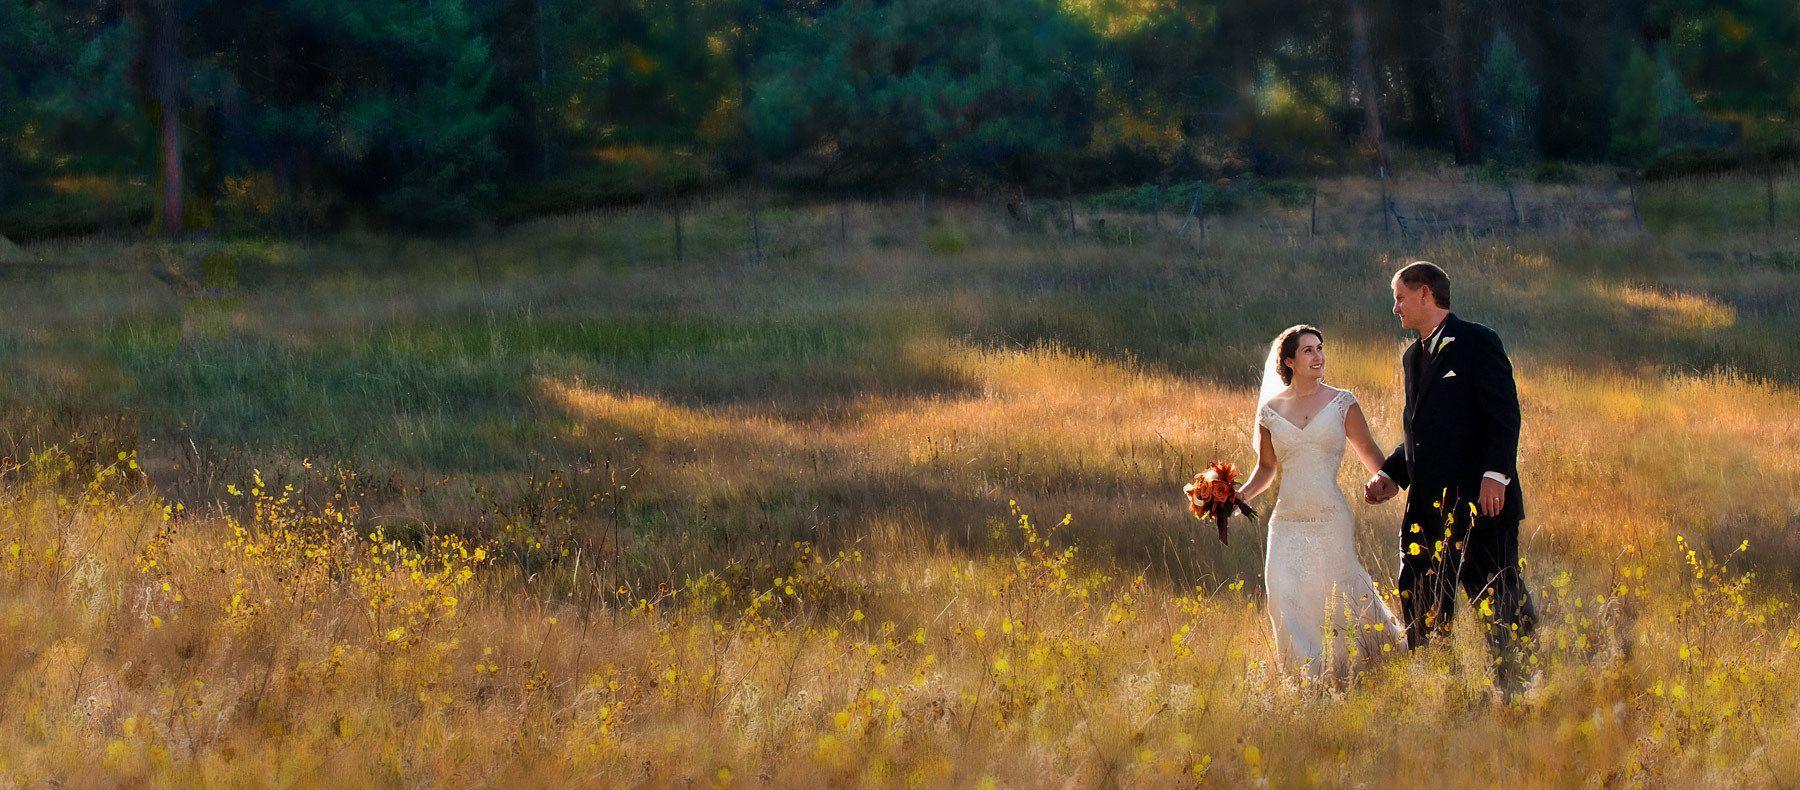 1wedding_romance_photography